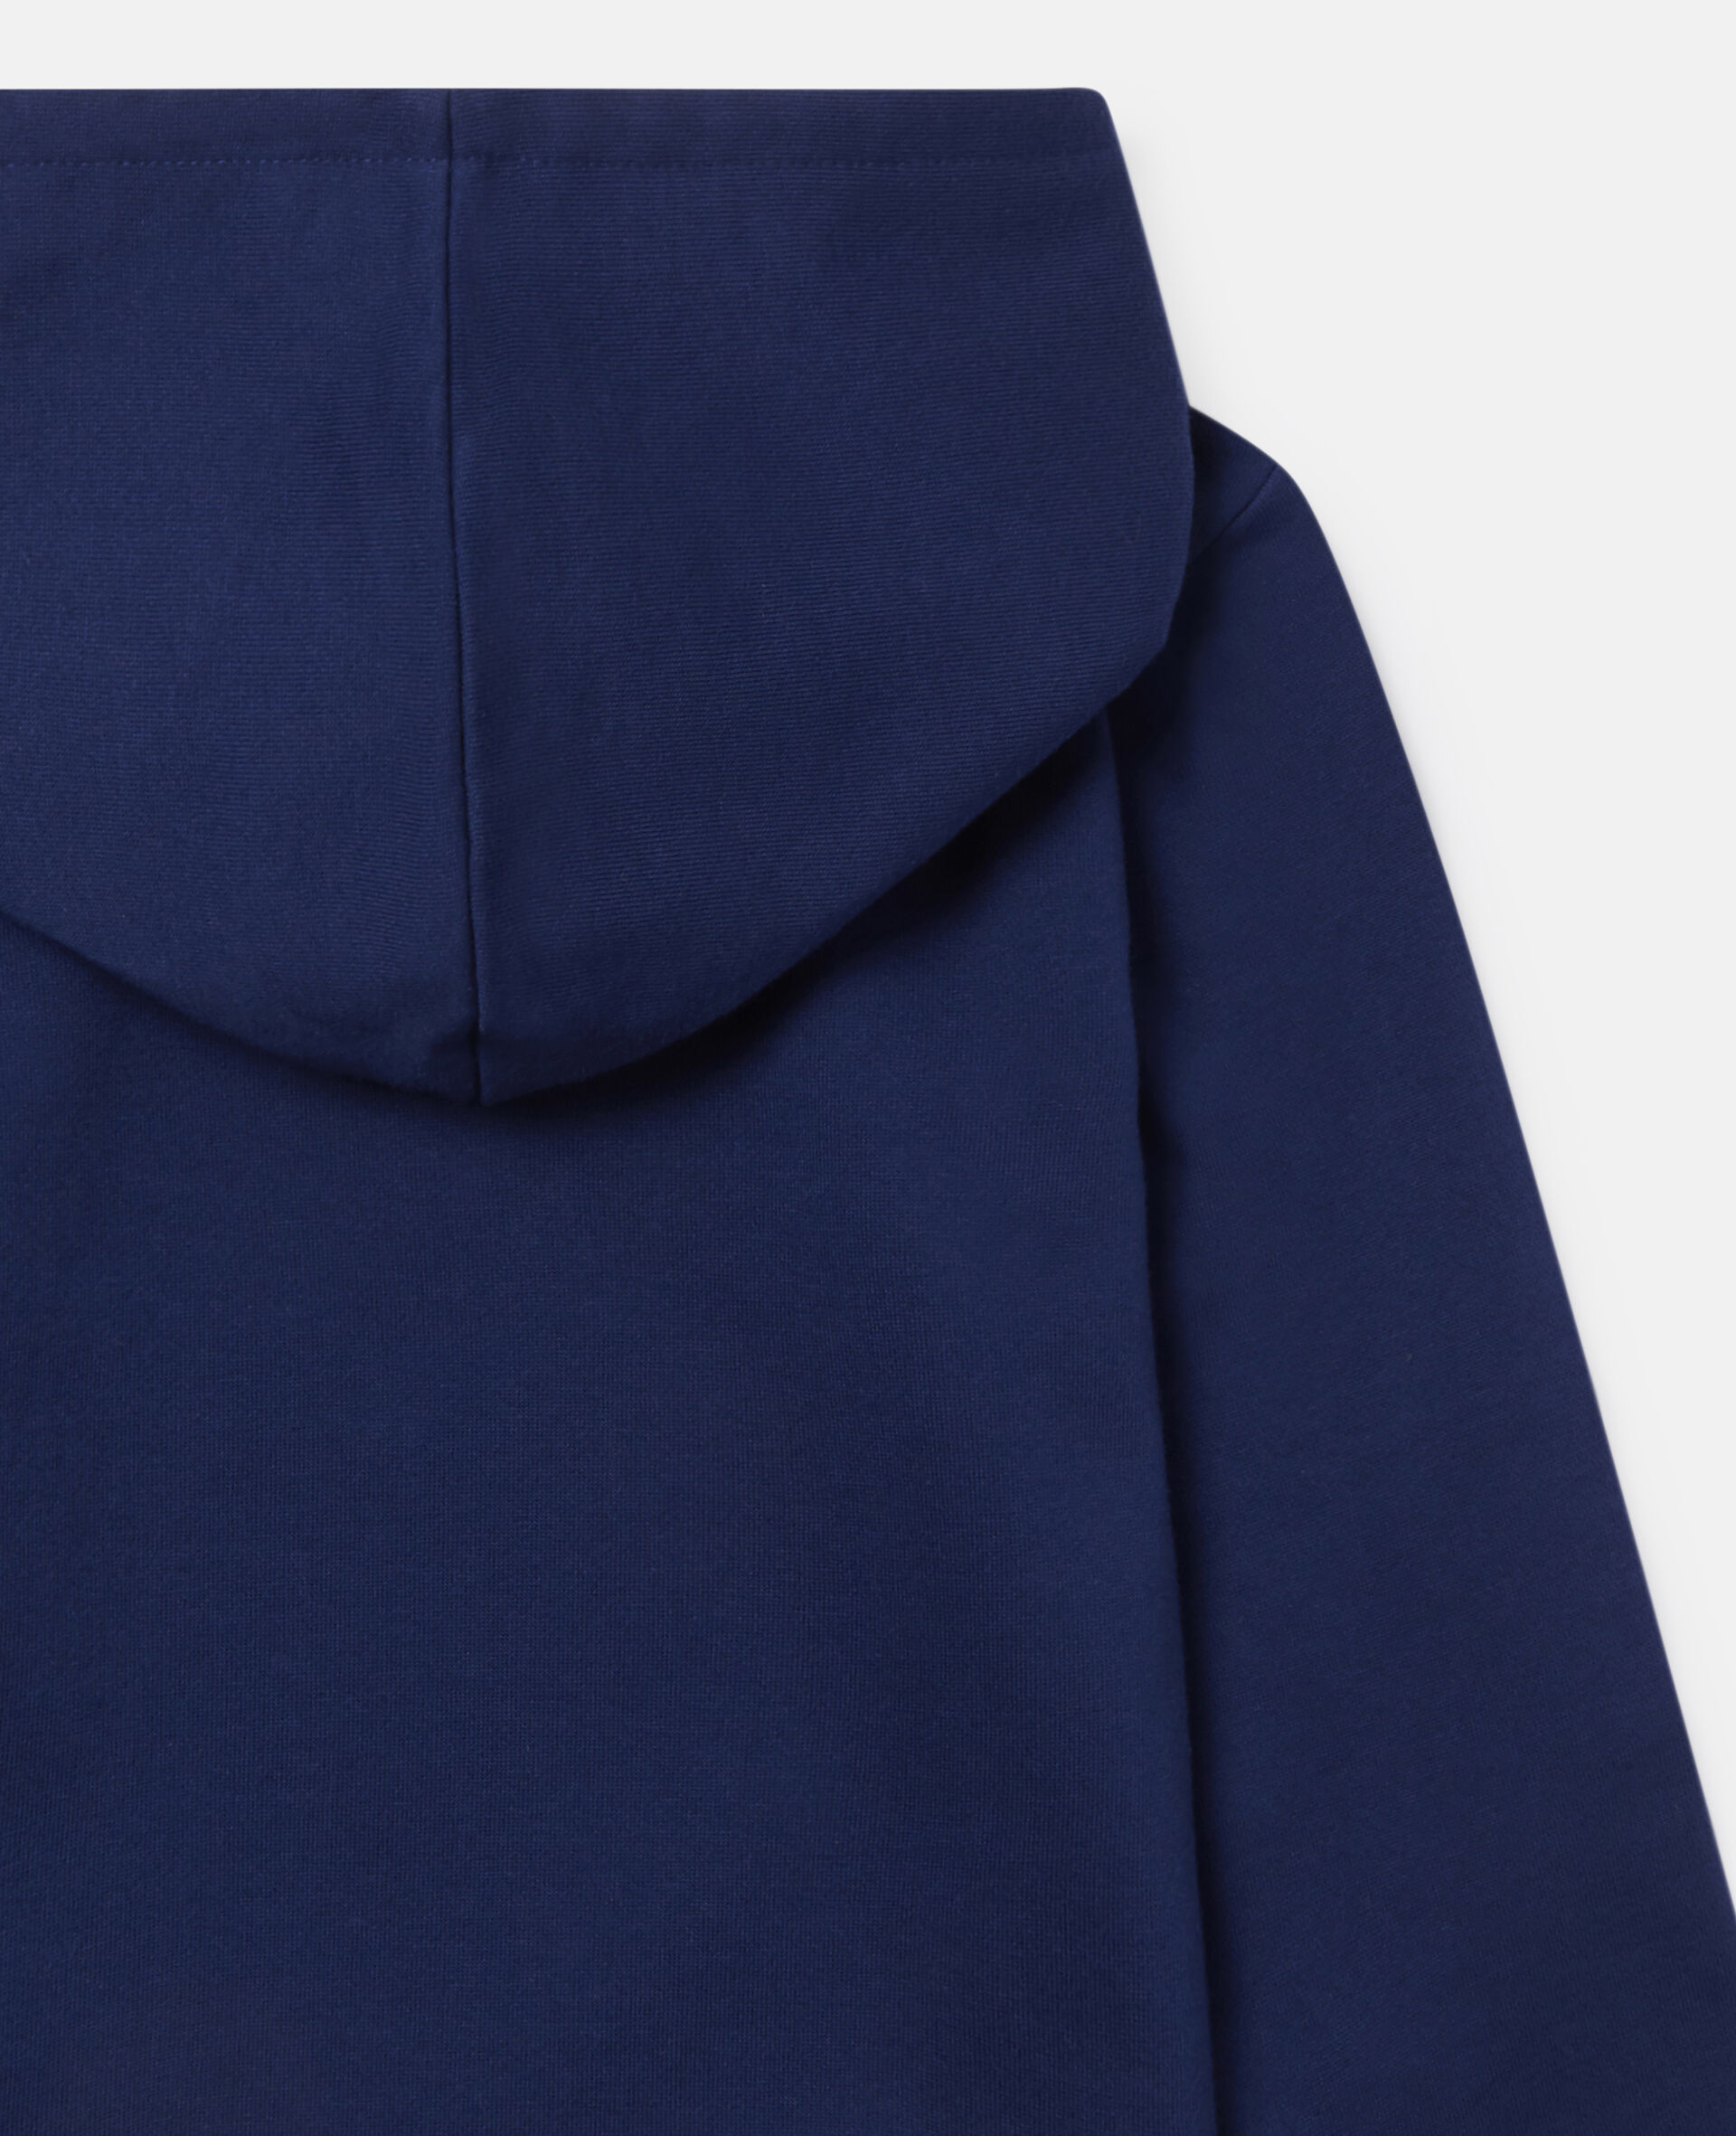 Oversized 'Eat My Dust' Fleece Hoodie-Blue-large image number 2